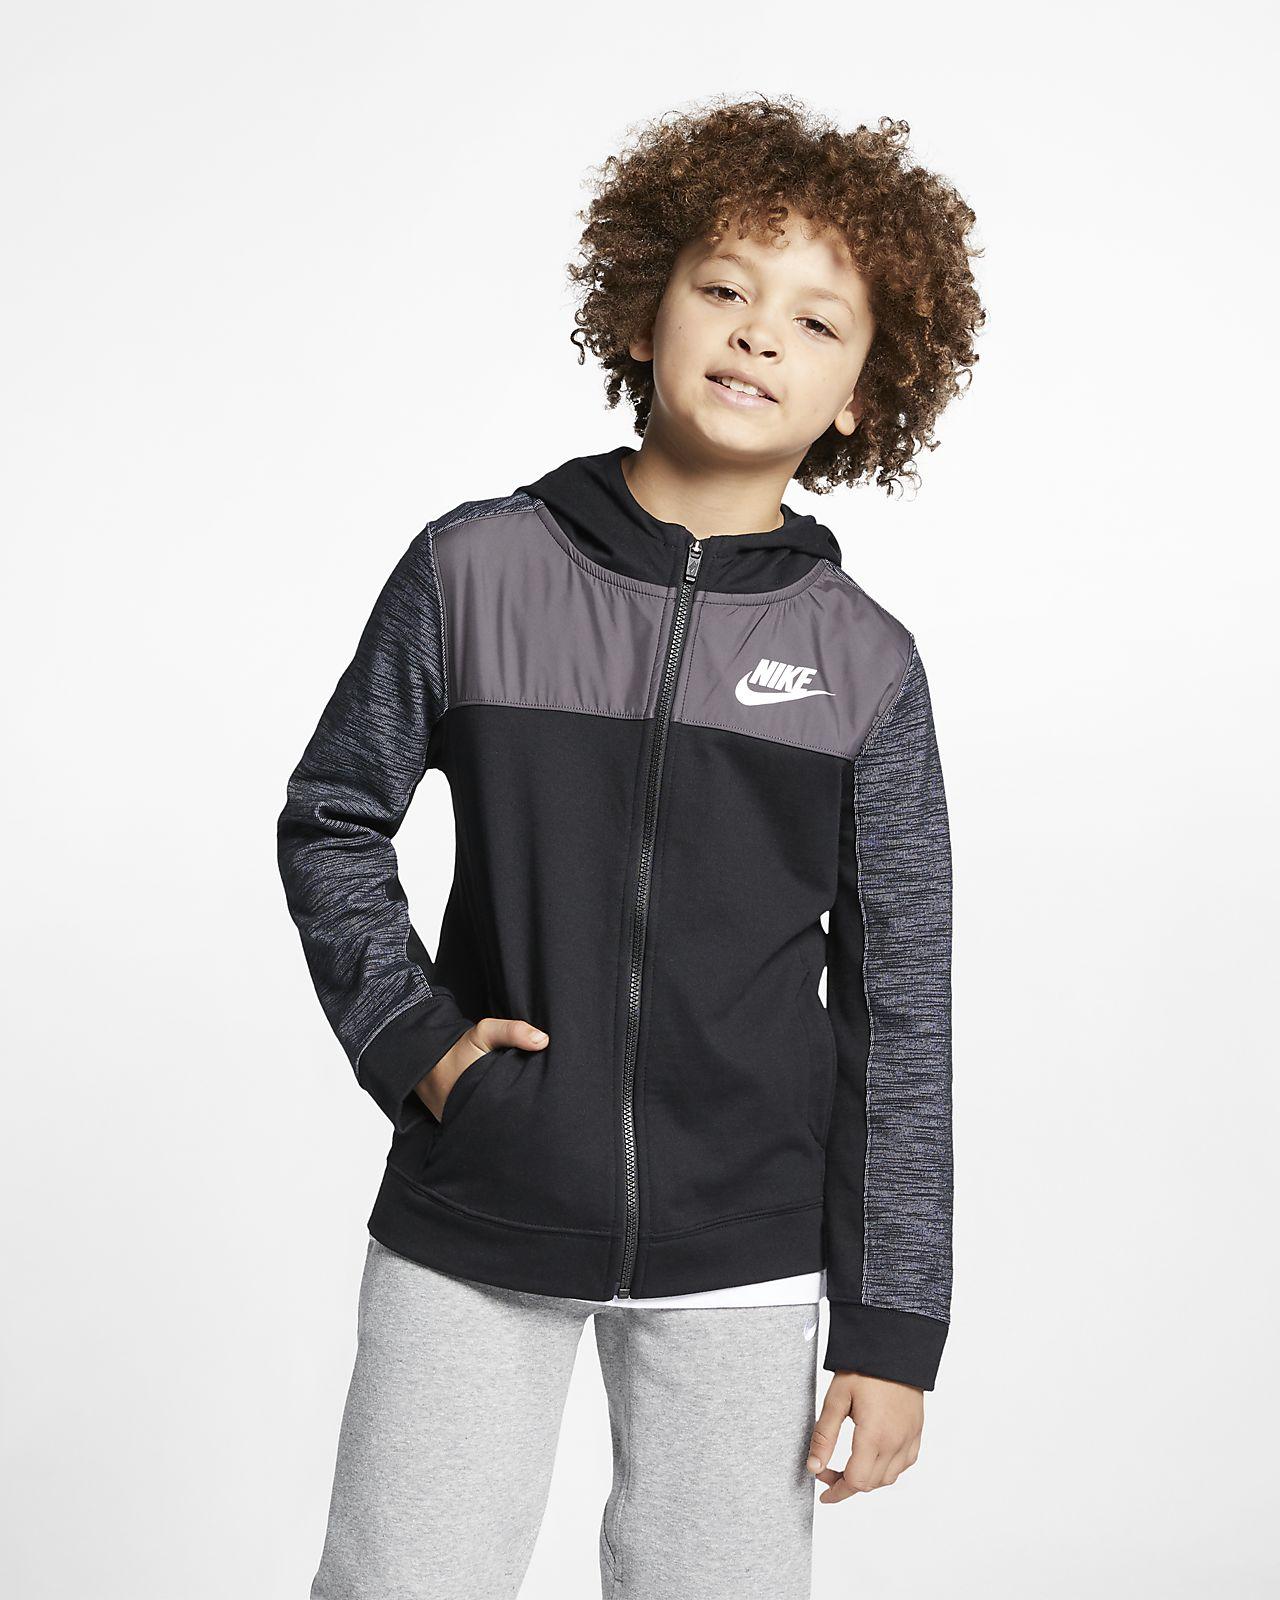 Sudadera Cremallera Sportswear Rqhrzxwc 15 Advance Con Nike Capucha qgZw7OpXnx